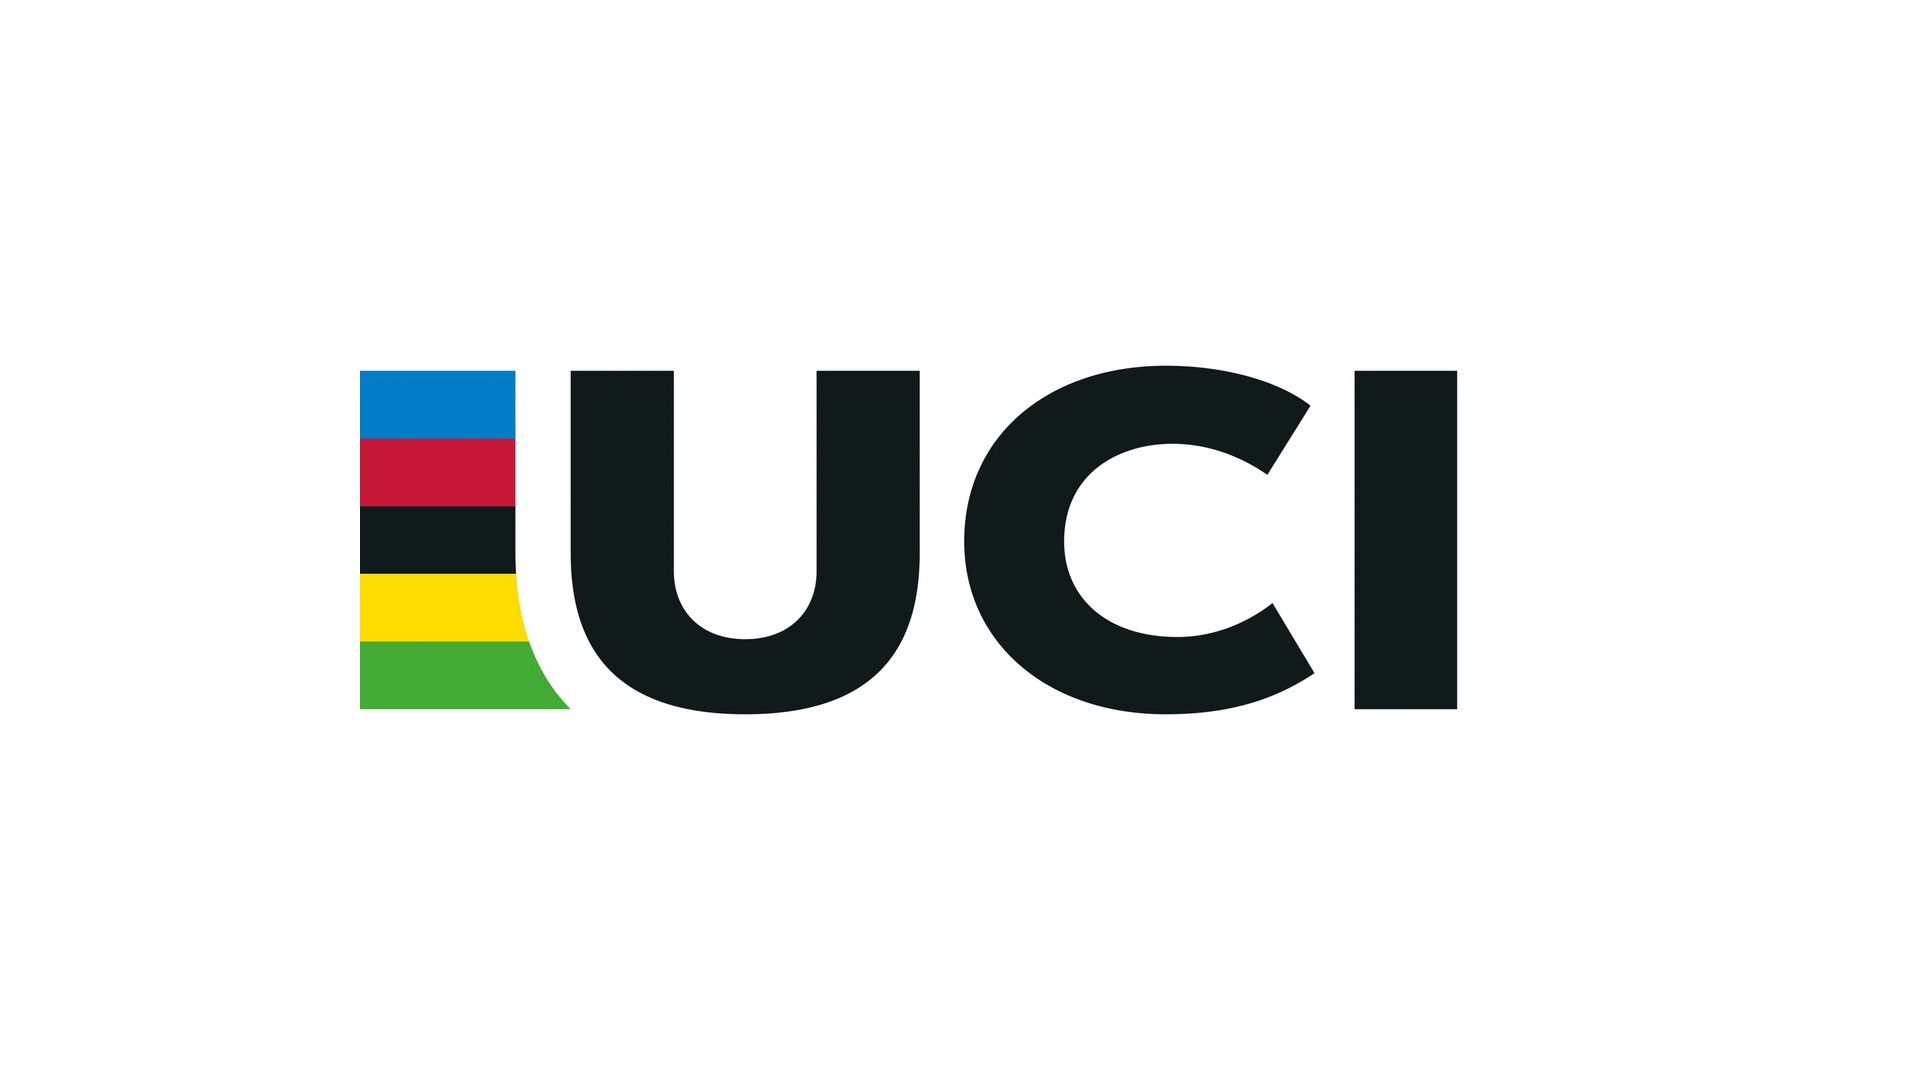 Cyclisme – UCI Union cycliste internationale logo